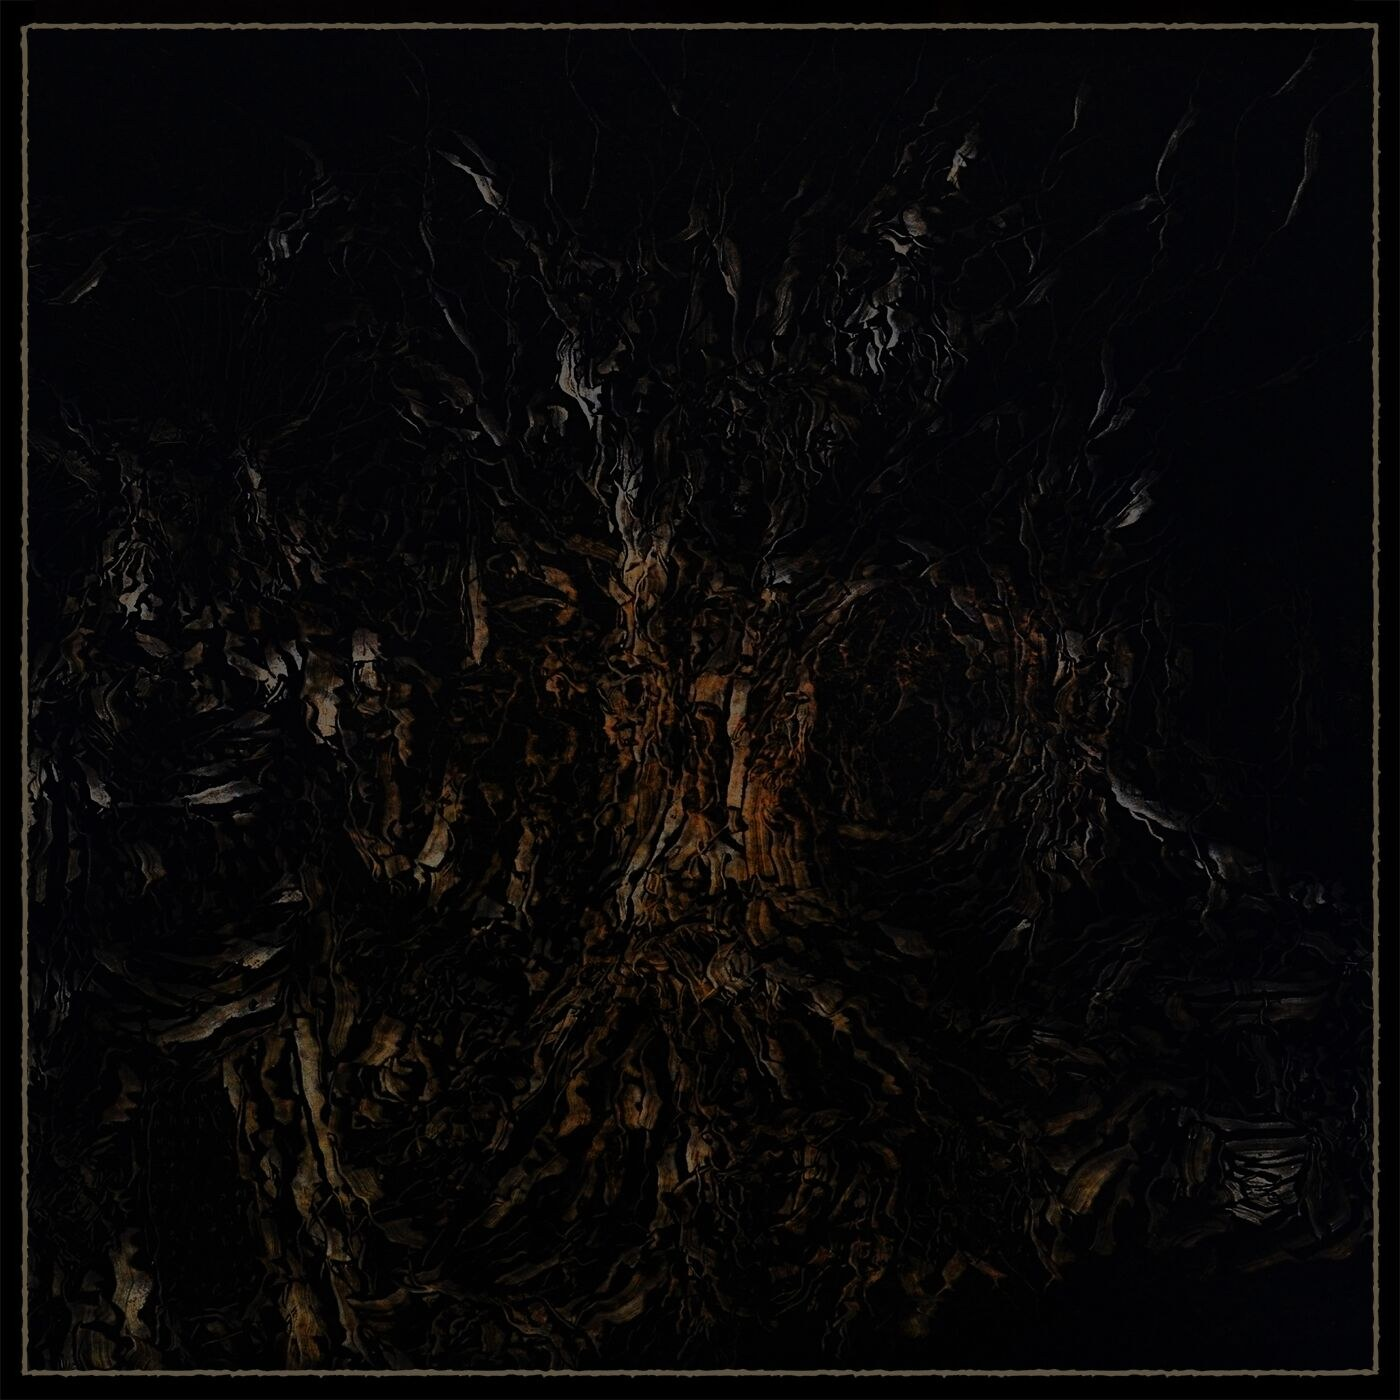 Review for Arkhaaik - *dʰg̑ʰm̥tós